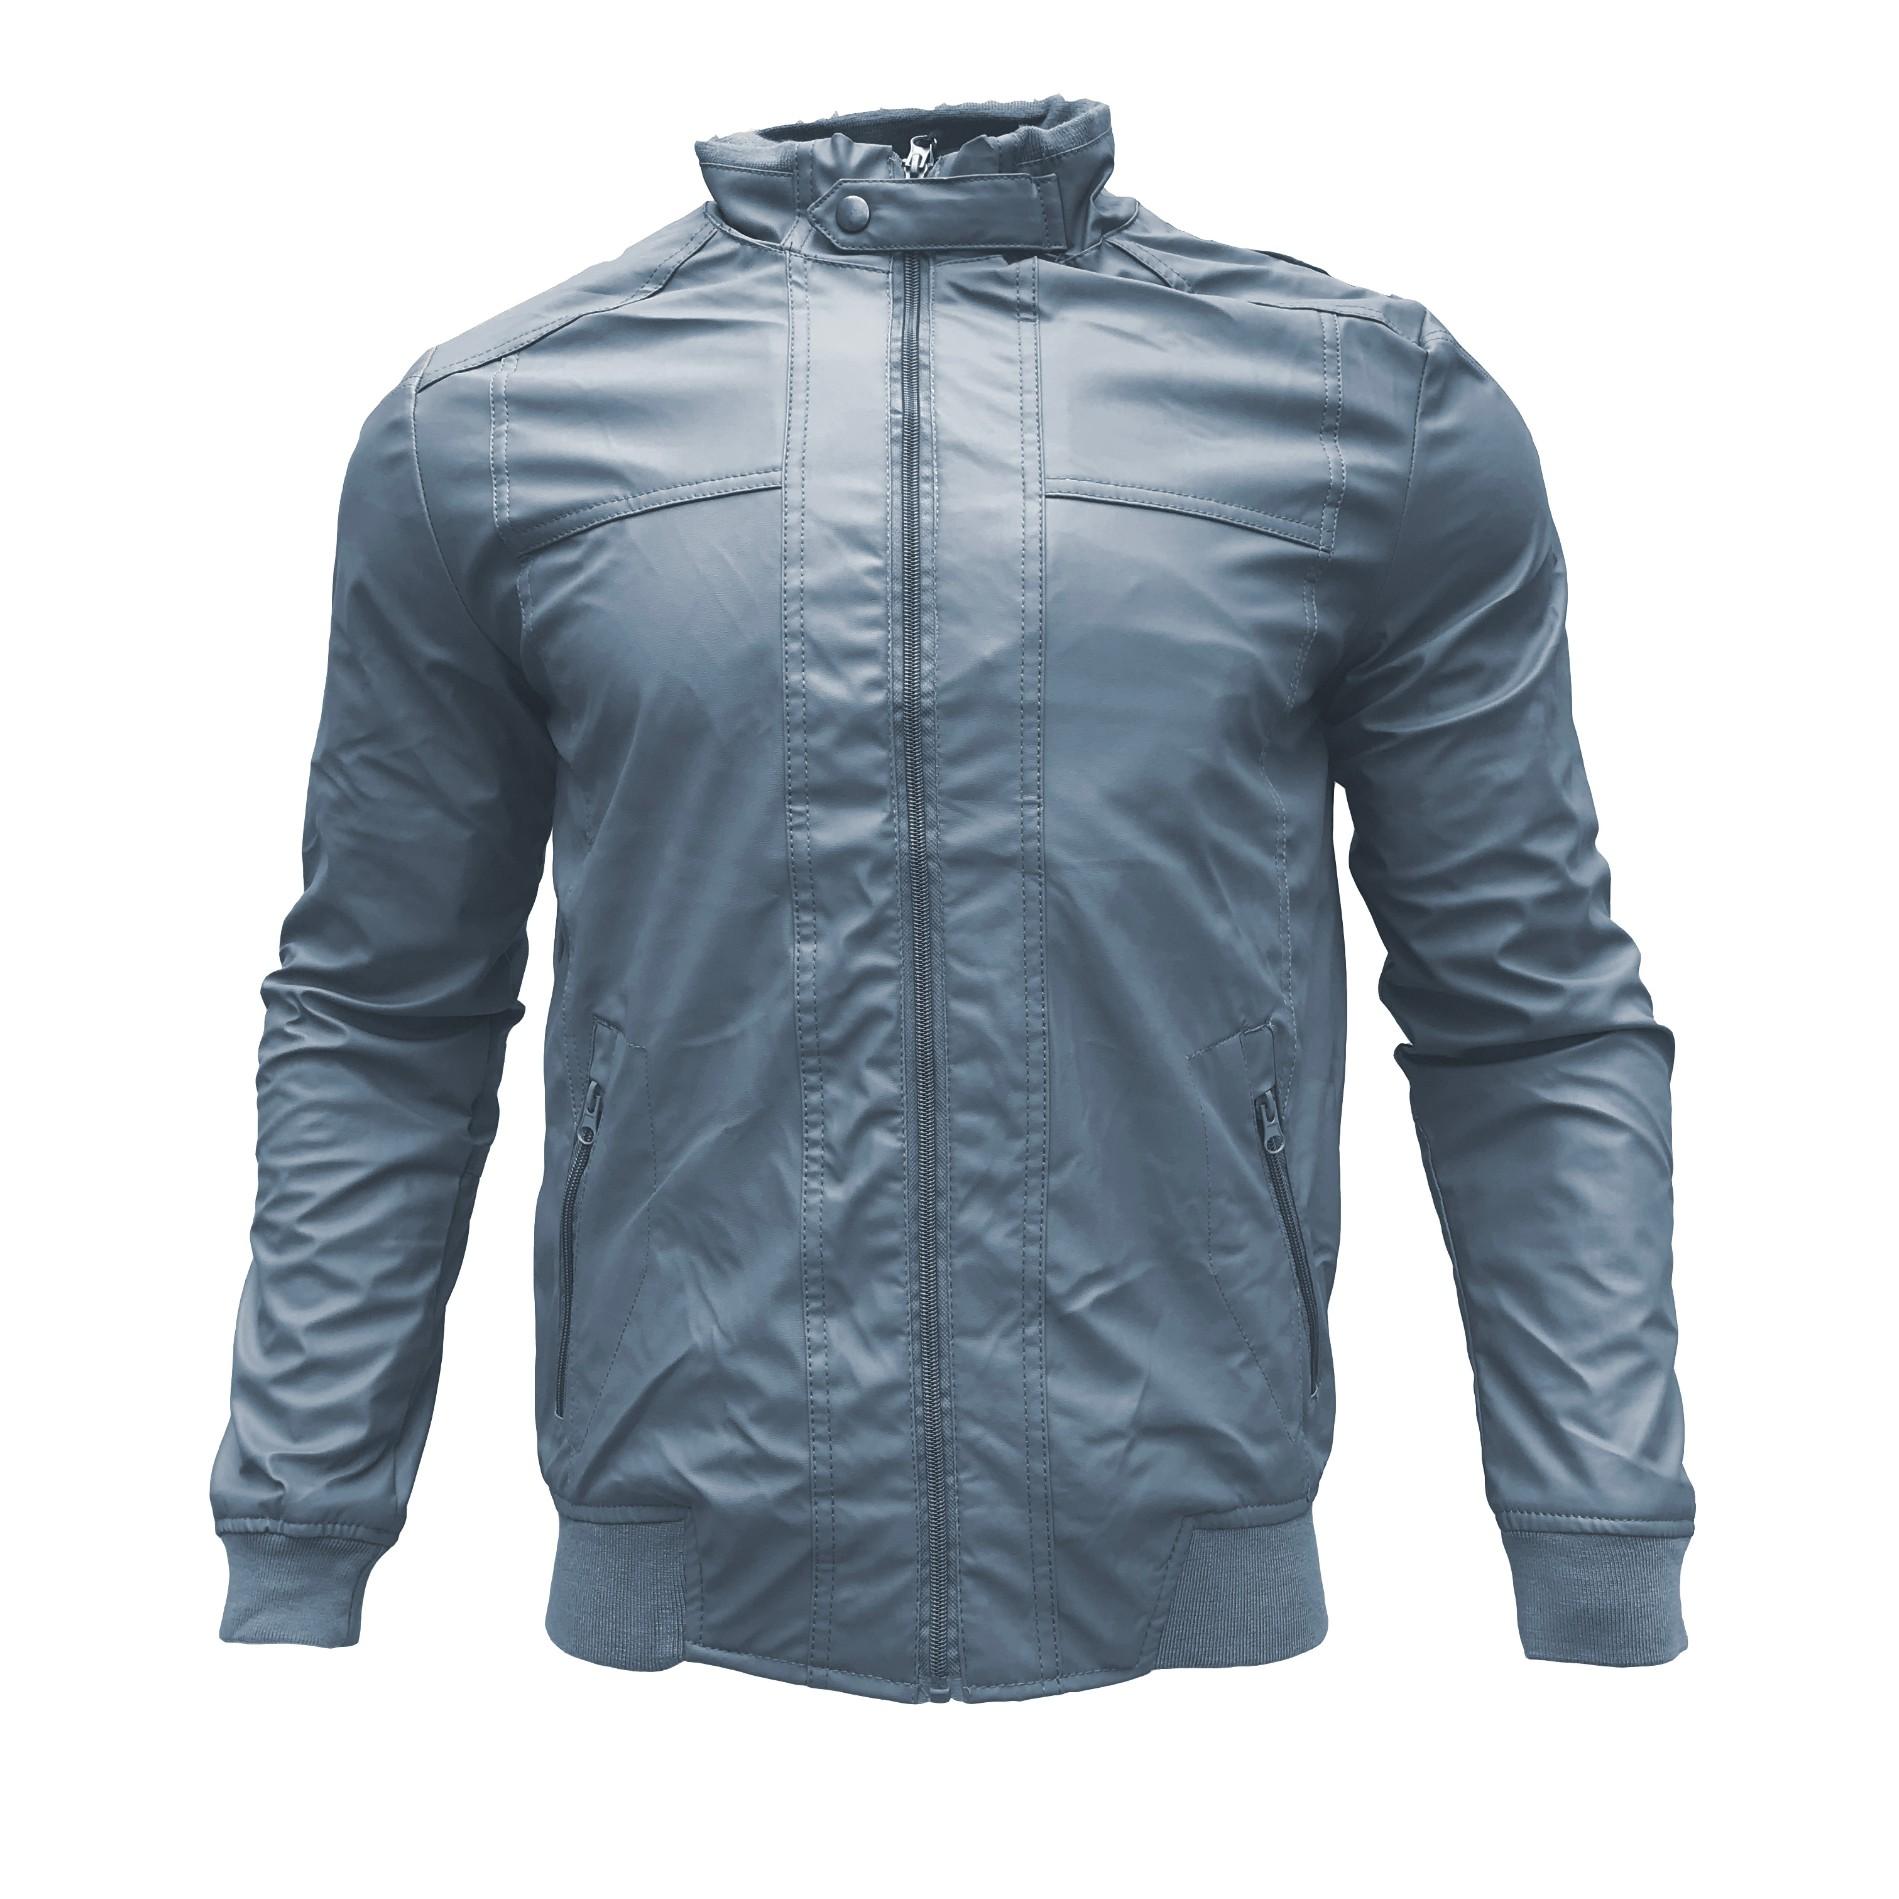 Men's PU Leather Jacket Man